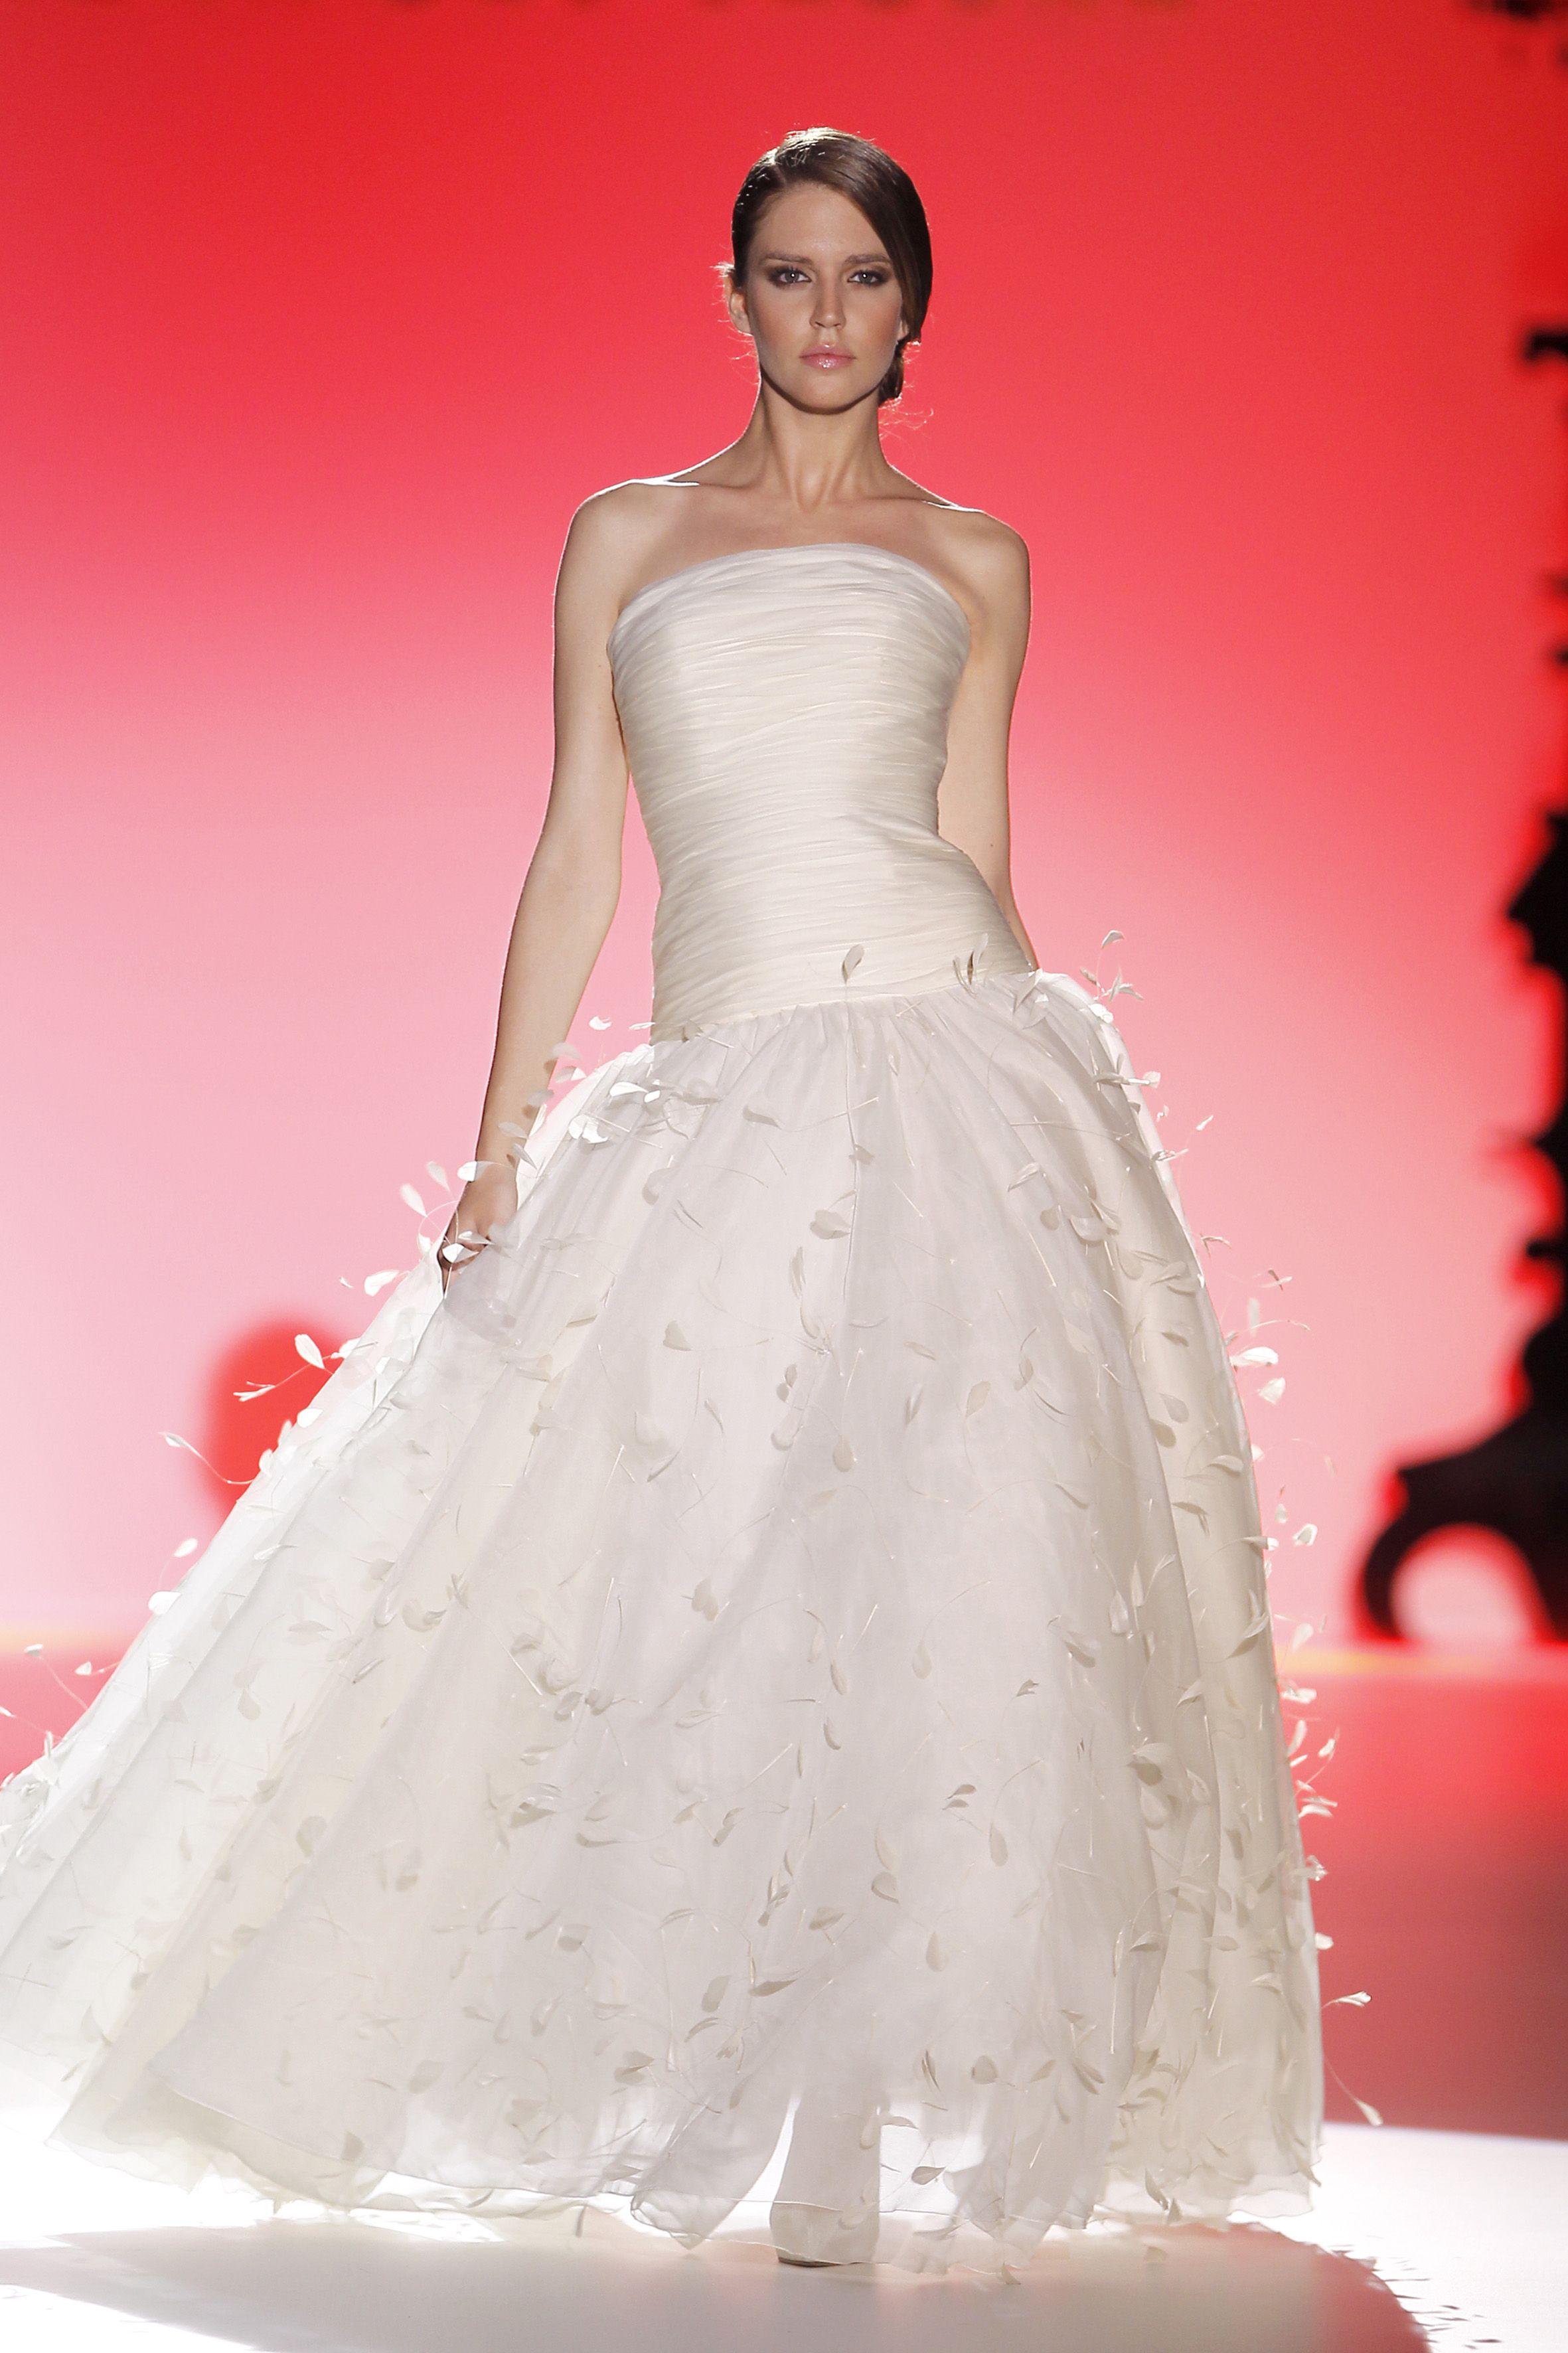 Barcelona bridal week. Diseño: Hannibal Laguna | Clothing, Jewelry ...